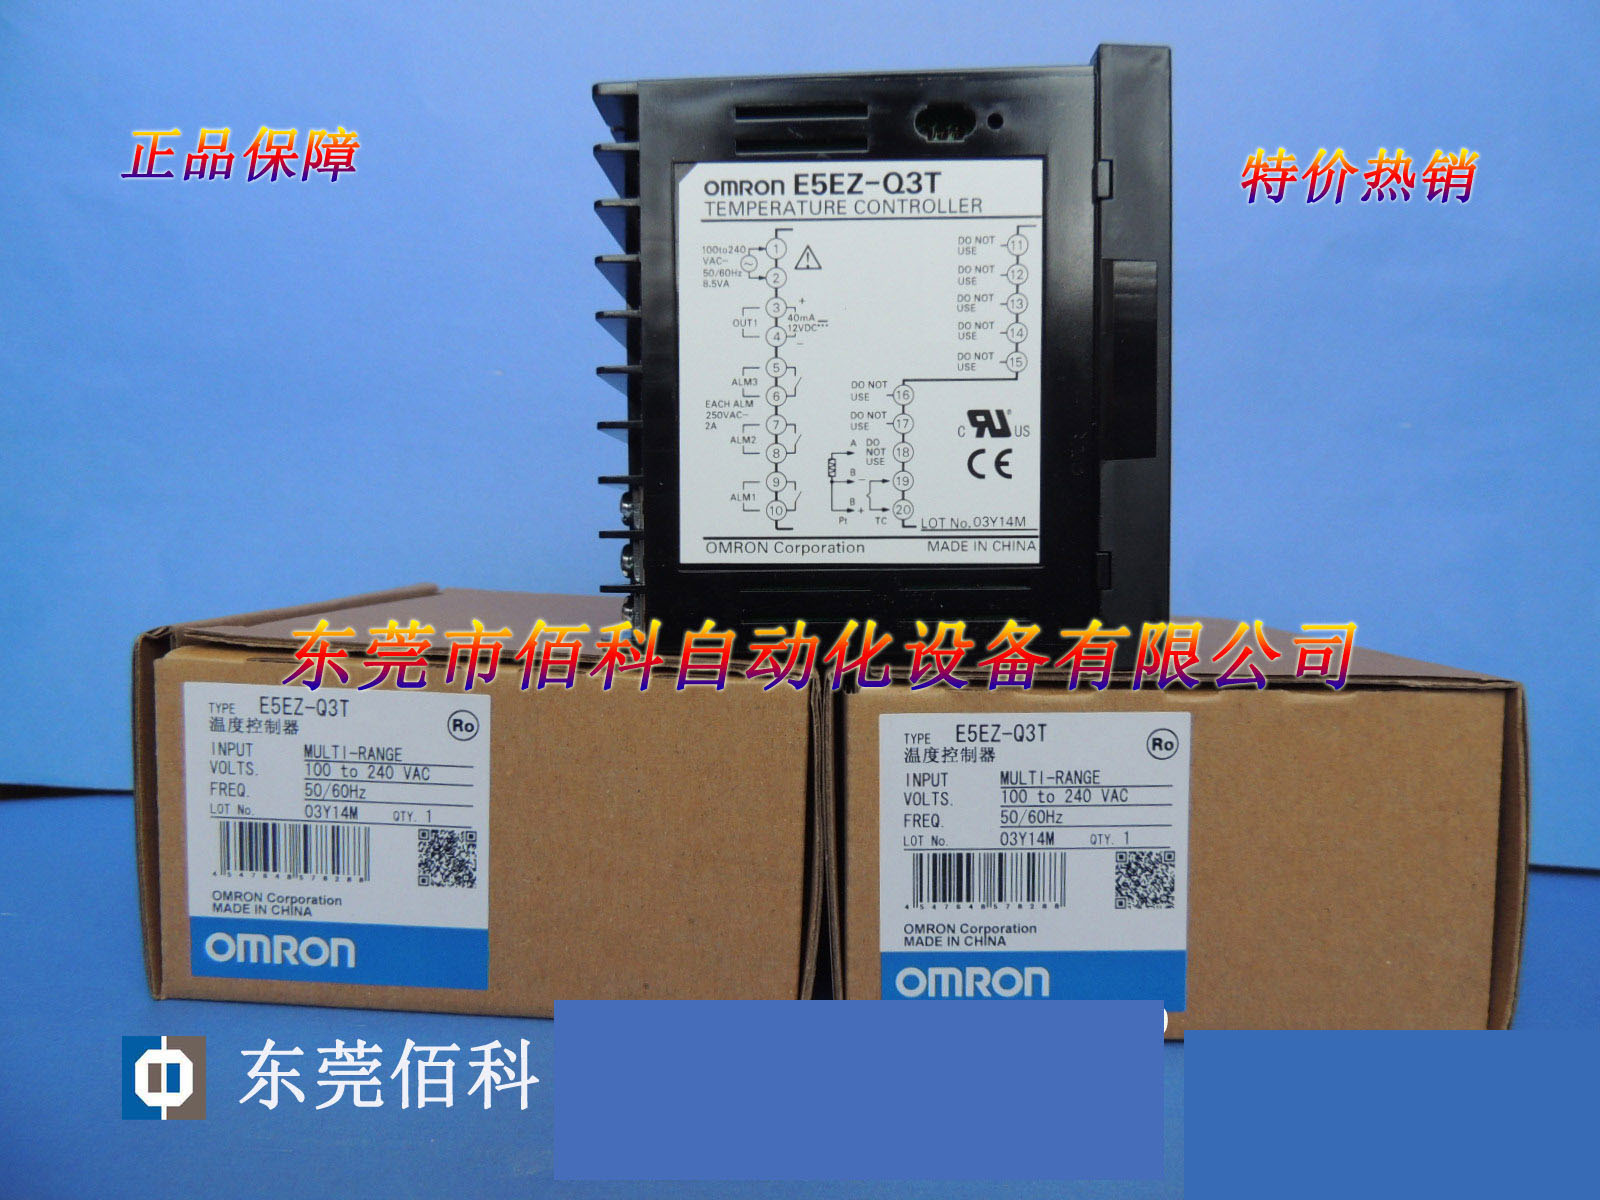 Nuovo termostato E5EZ-Q3TNuovo termostato E5EZ-Q3T